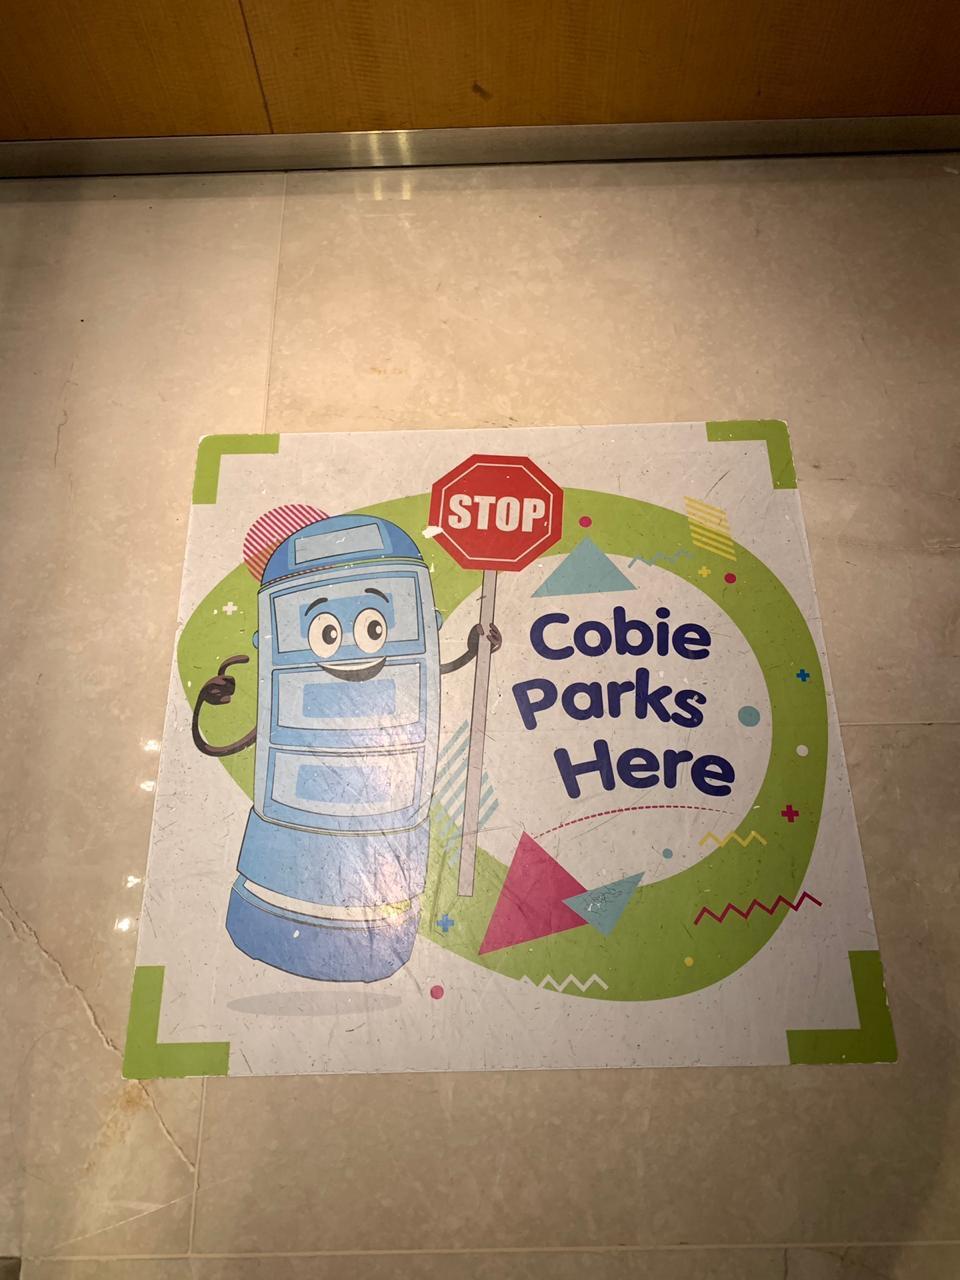 Cobie's parking spot in the lift